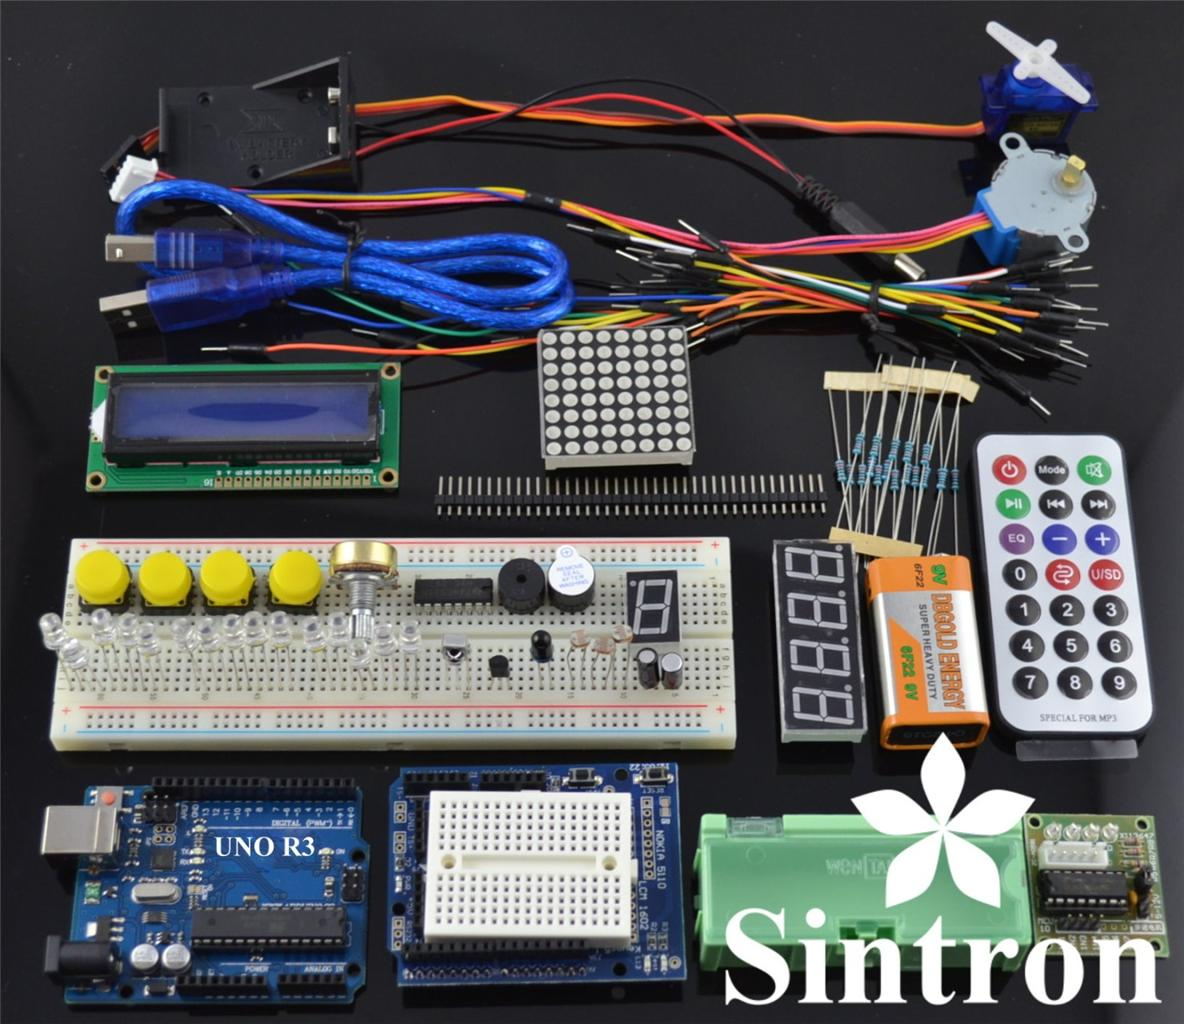 Sintron uno r upgrade kit with motor lcd servo module